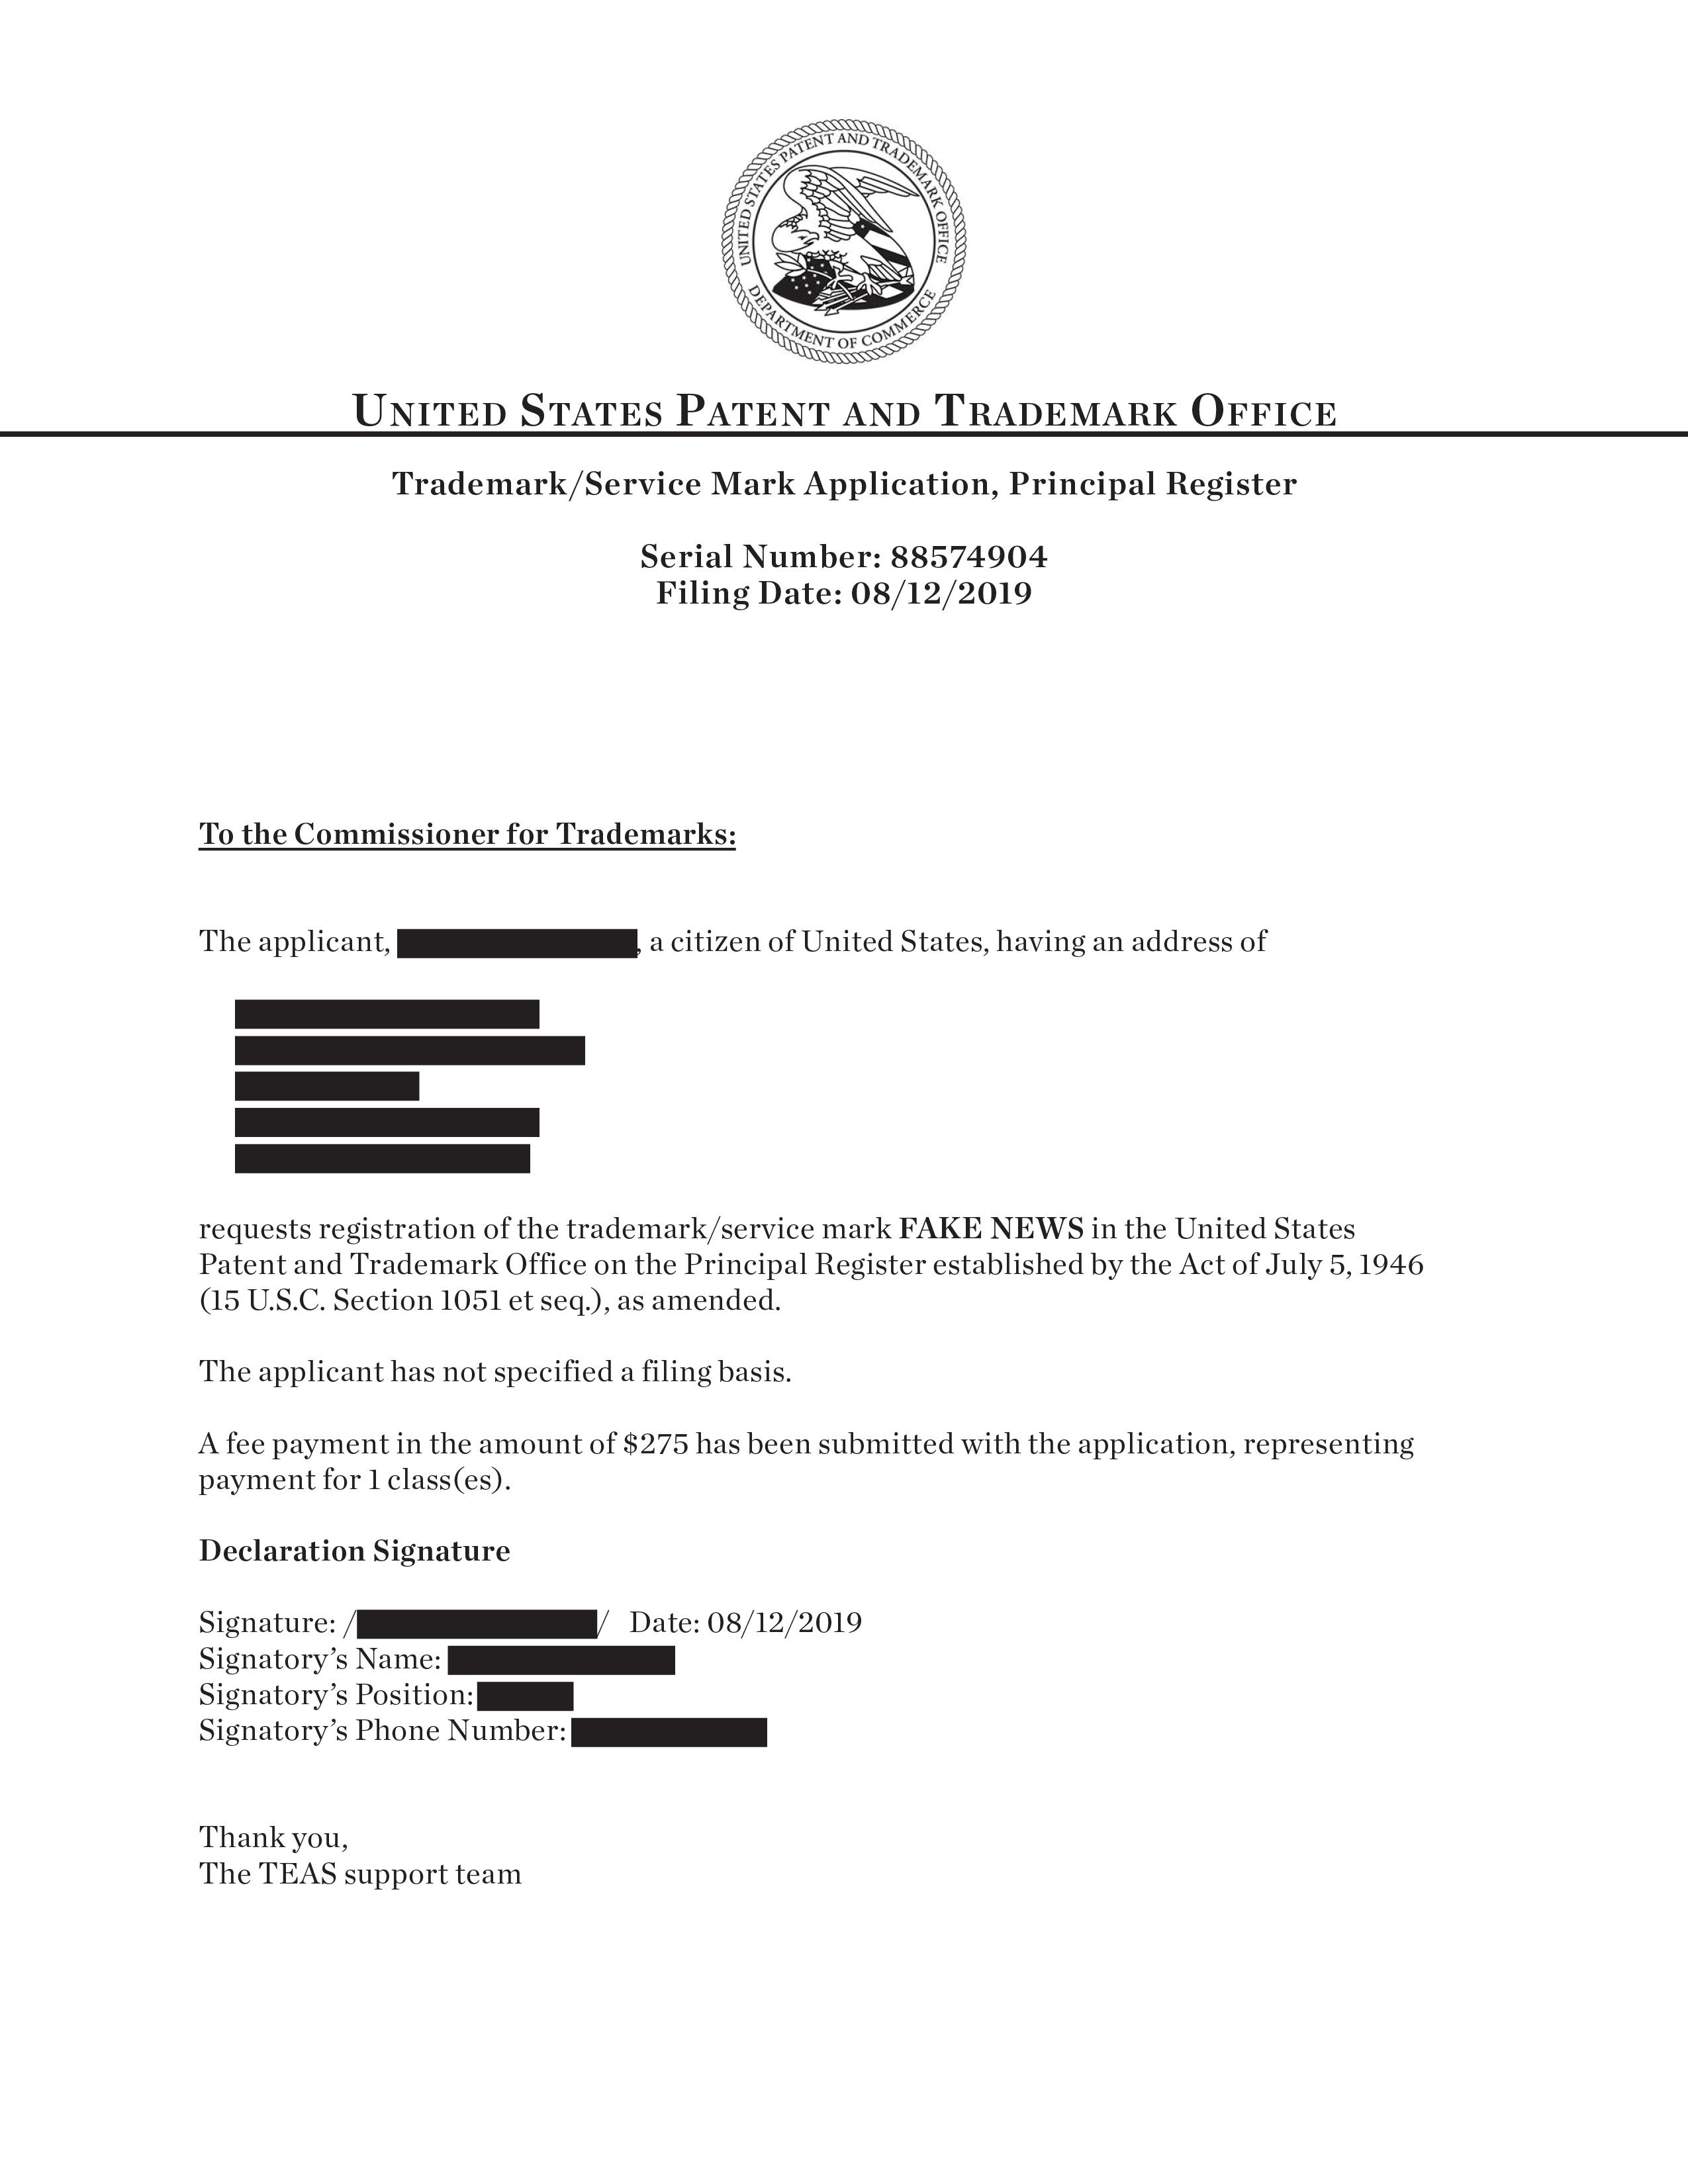 FakeNews_TrademarkApplication (1)